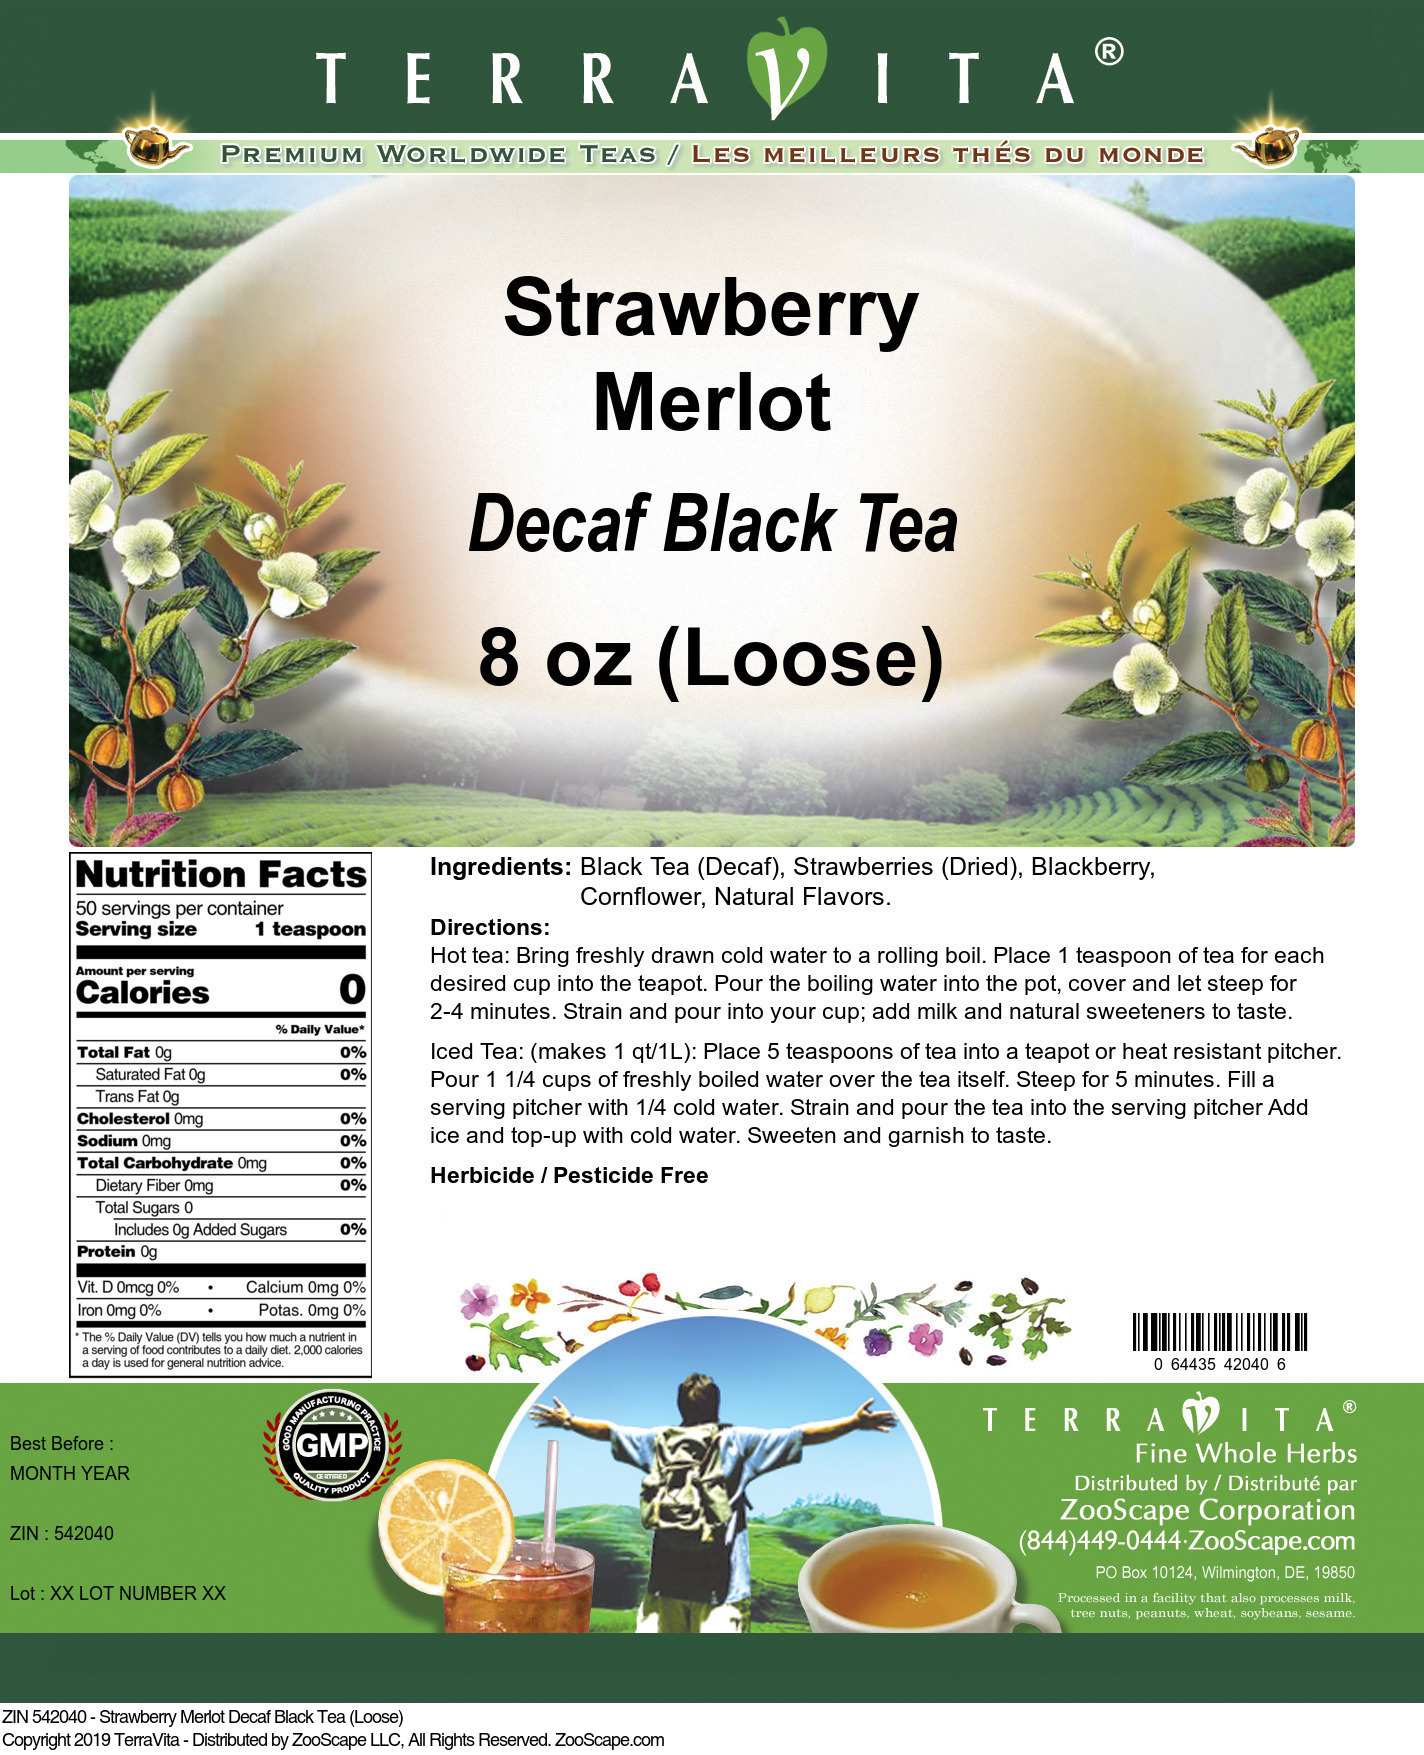 Strawberry Merlot Decaf Black Tea (Loose)